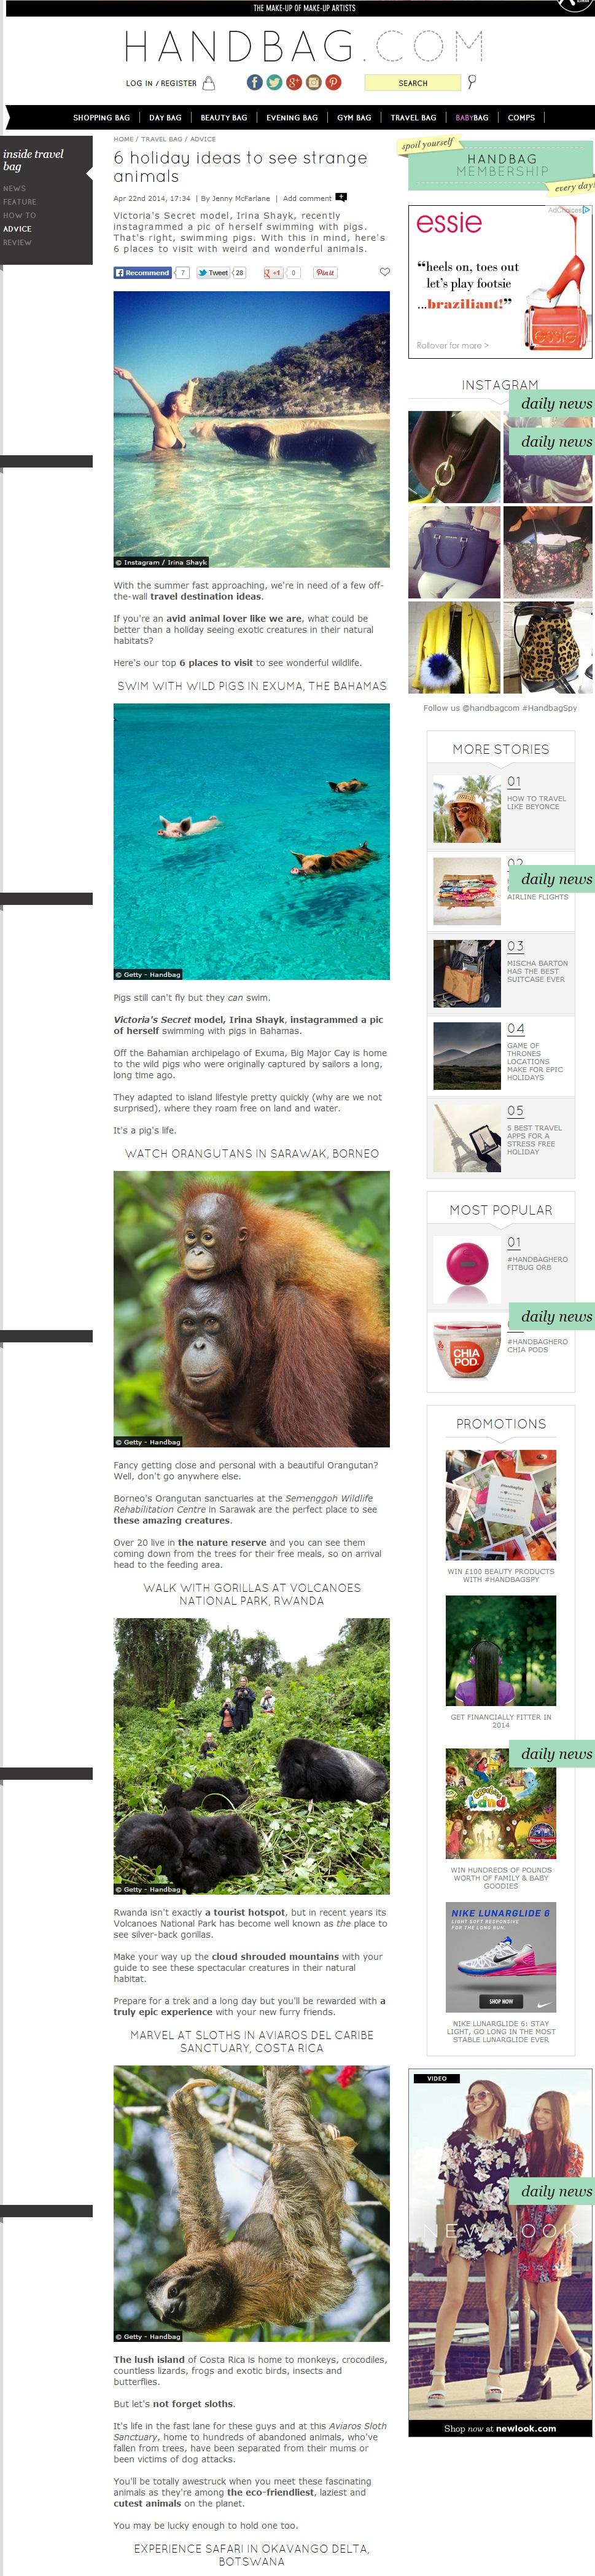 screencapture-www-handbag-com-travel-bag-advice-a565962-6-holiday-ideas-to-see-strange-animals-html